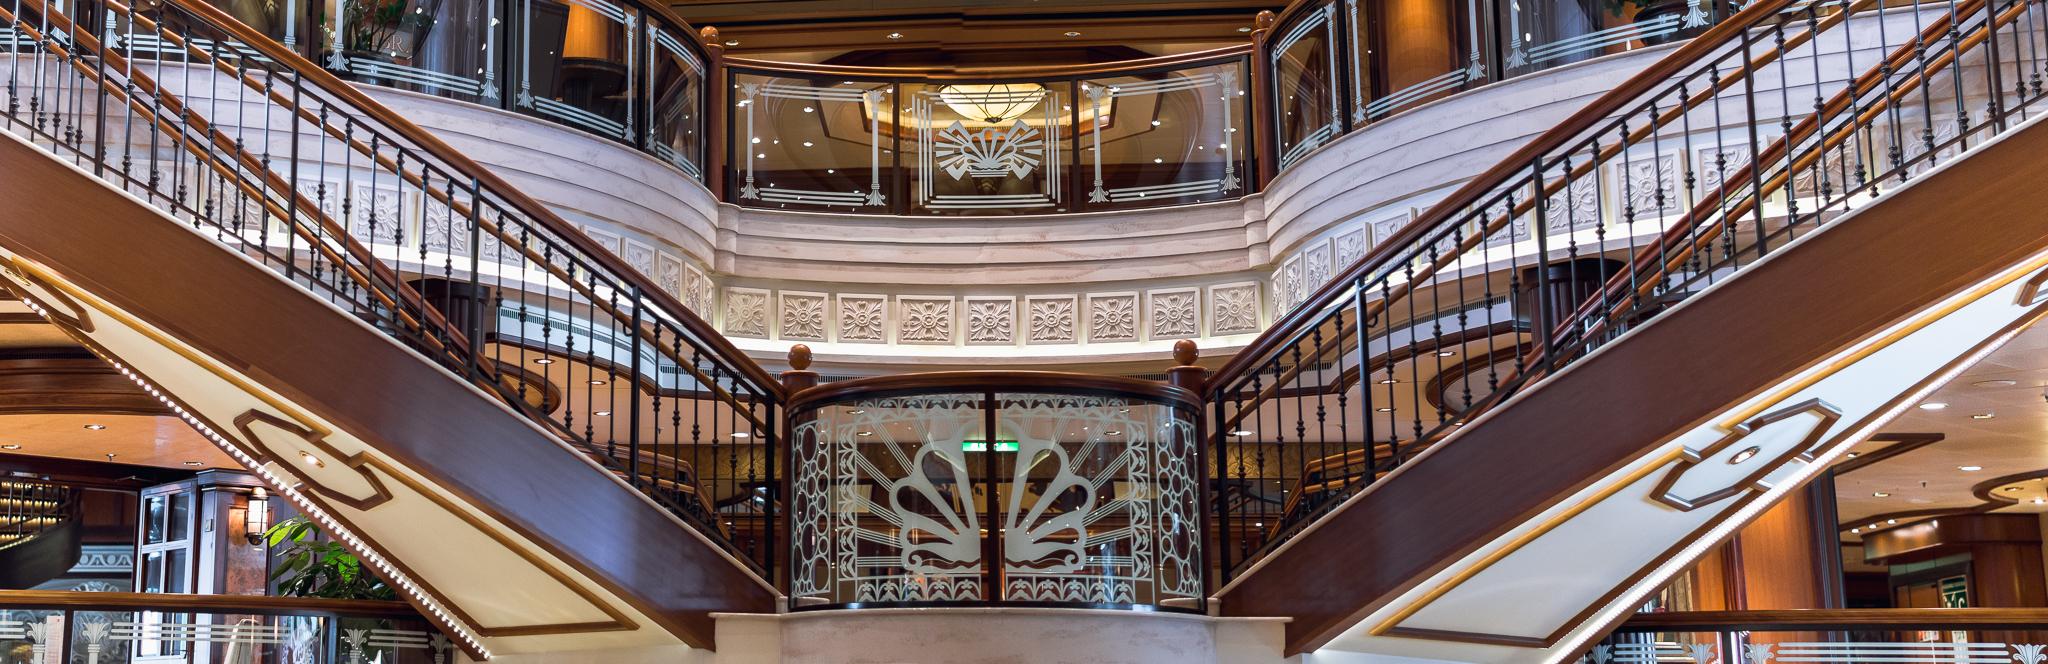 Cunard - Queen Elizabeth